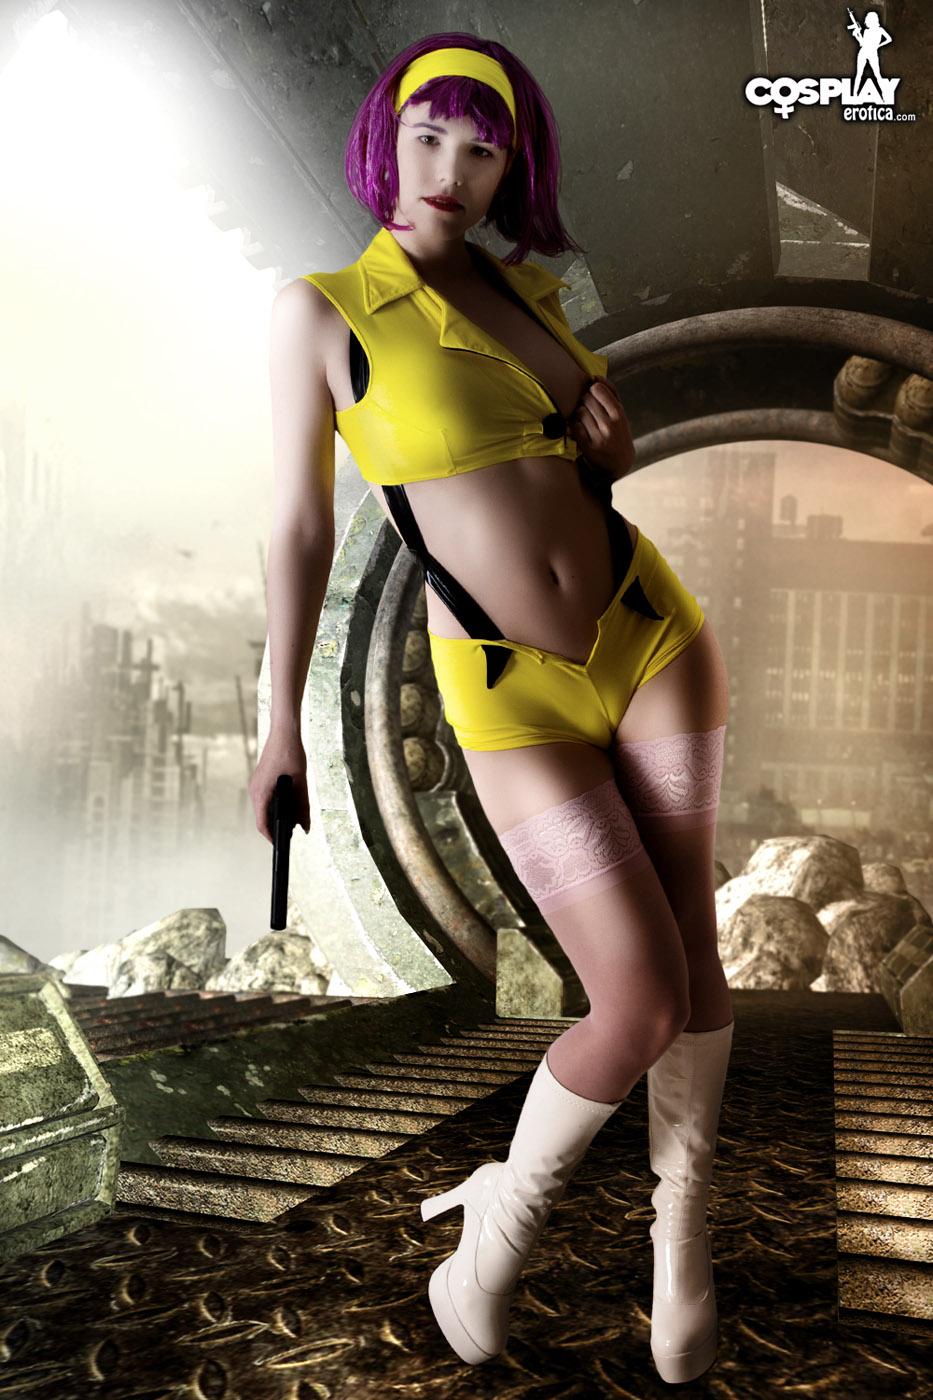 Cassie Abandoned Gates Cosplay Erotica-3824